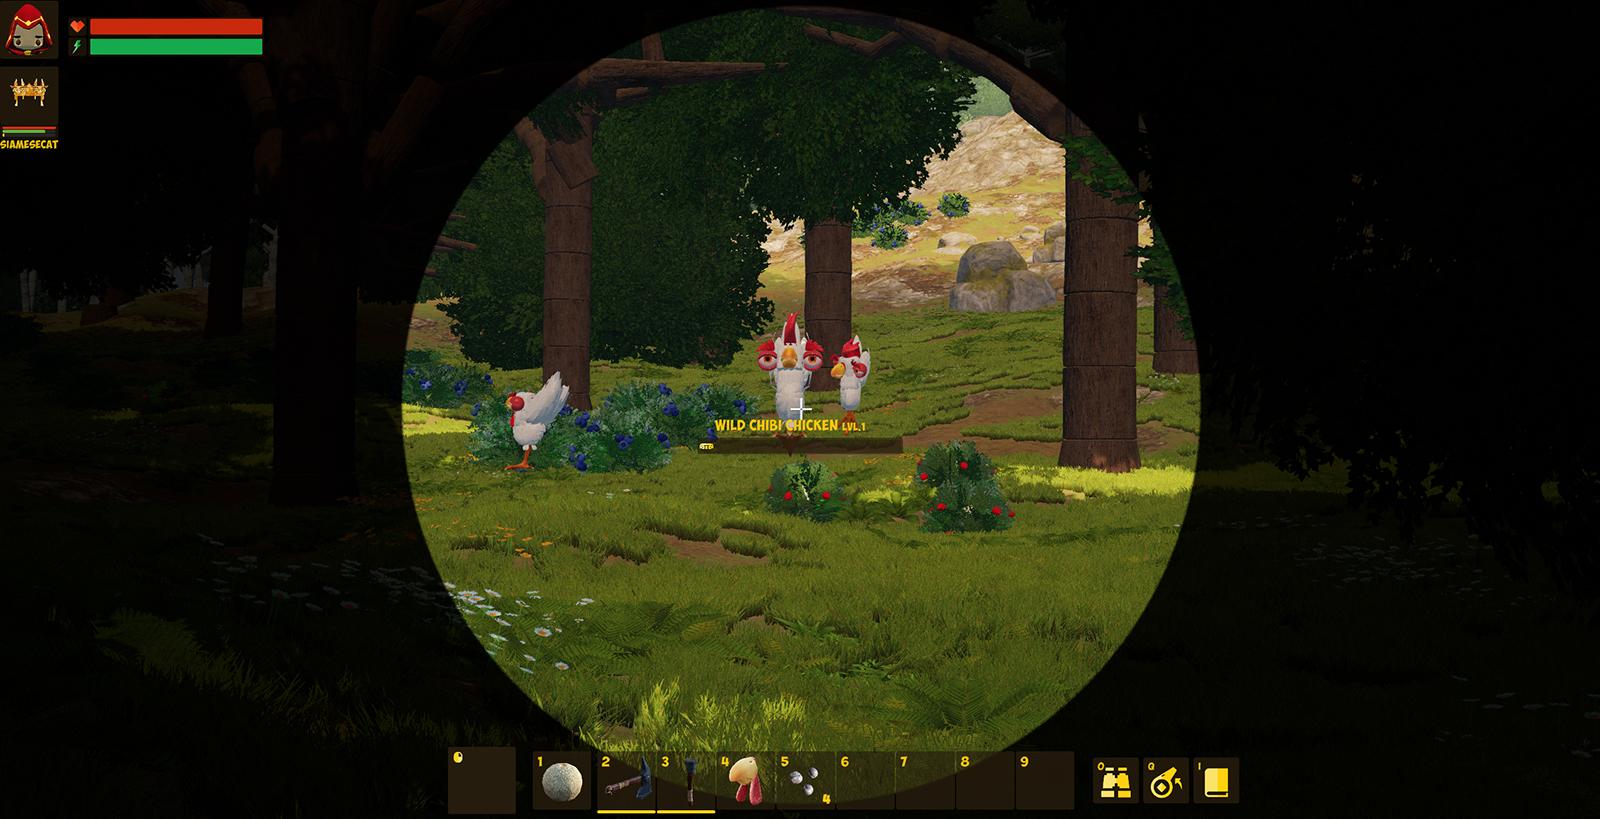 binocularspreview